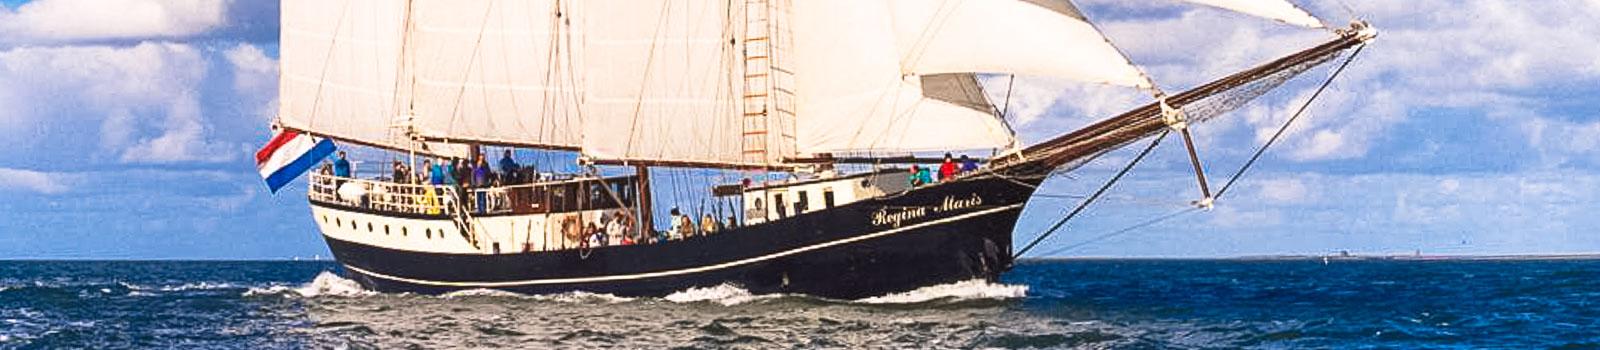 Traditionssegler mieten zeigt Segelschiff